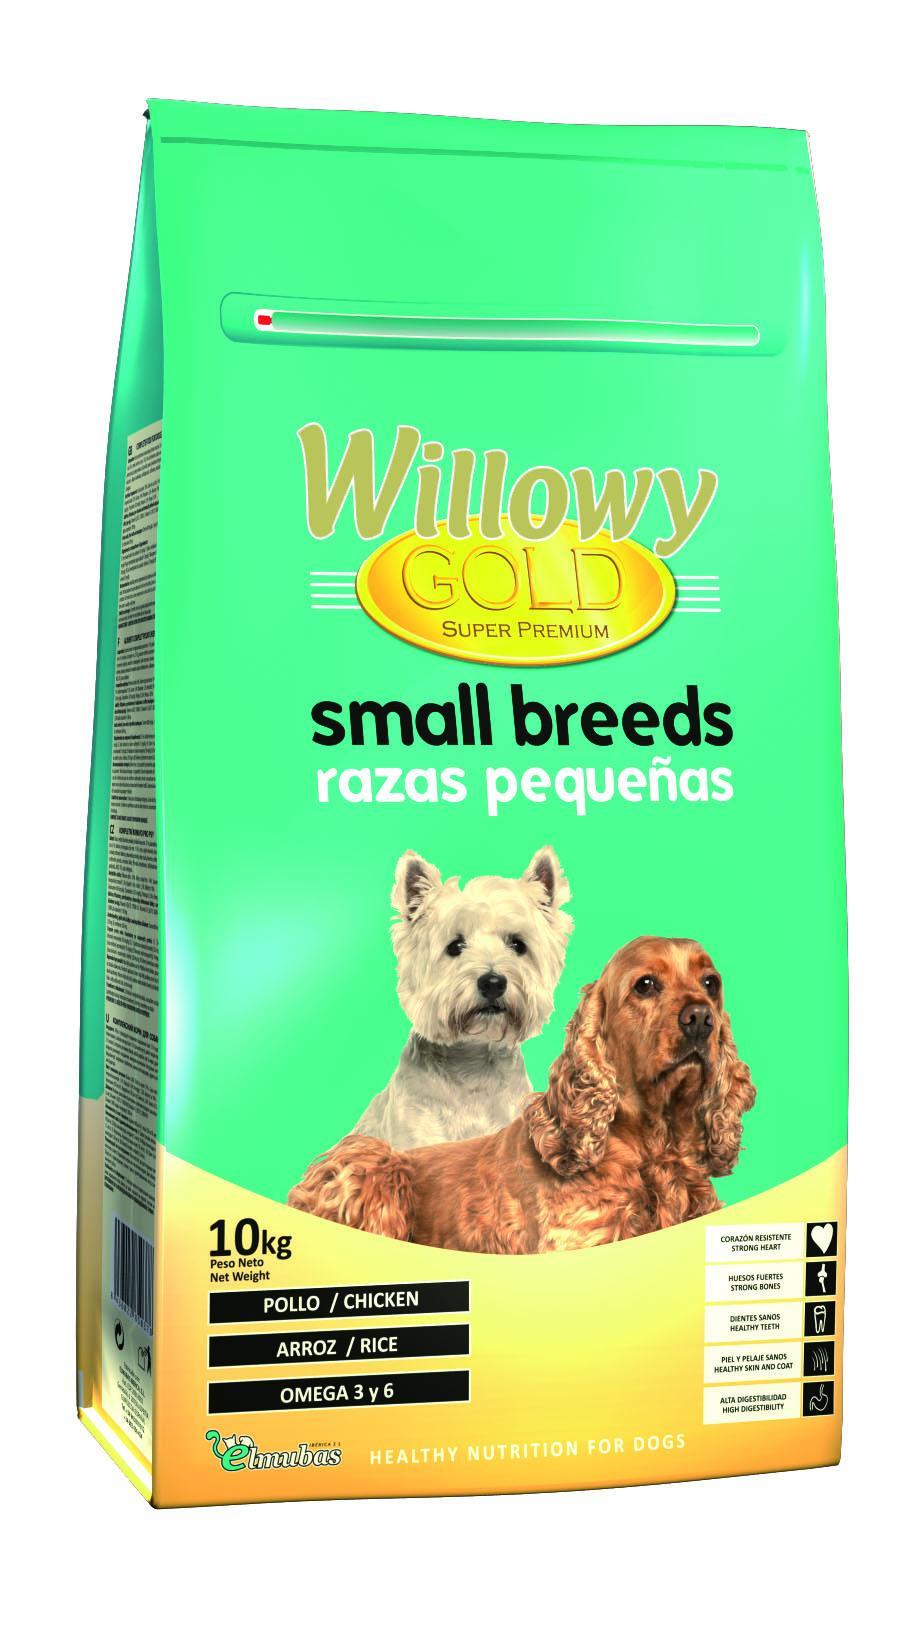 Willowy Gold RAZAS PEQUEÑAS